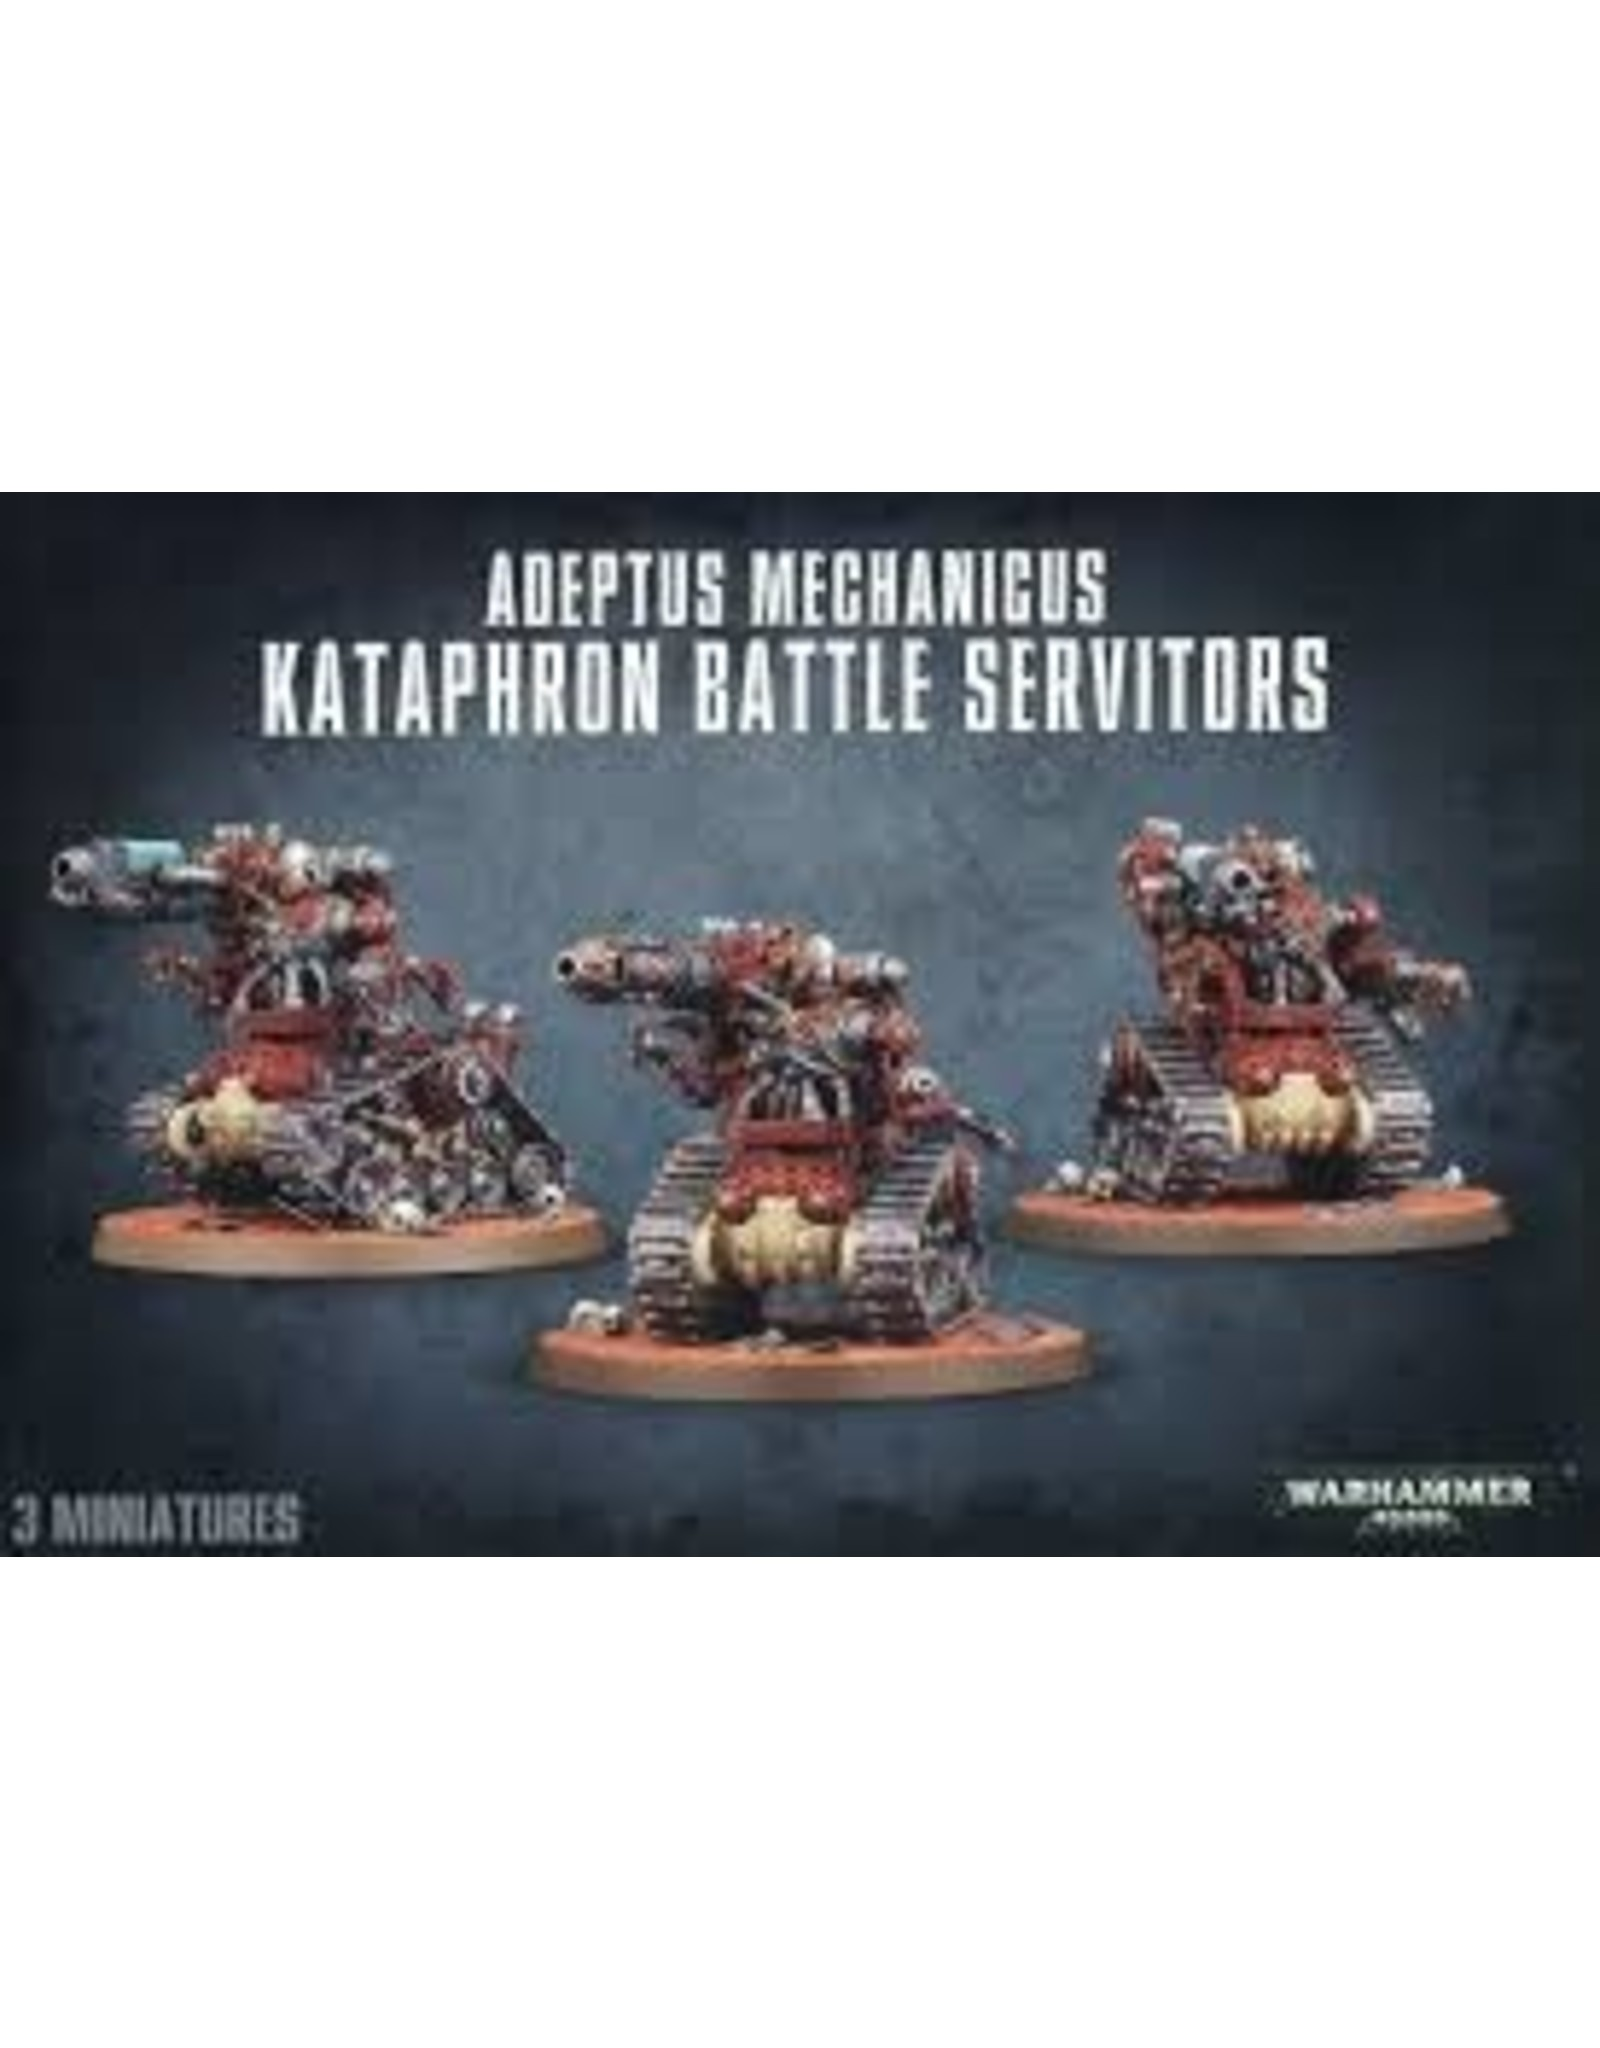 Warhammer 40K Adeptus Mechanicus Kataphron Battle Servitors